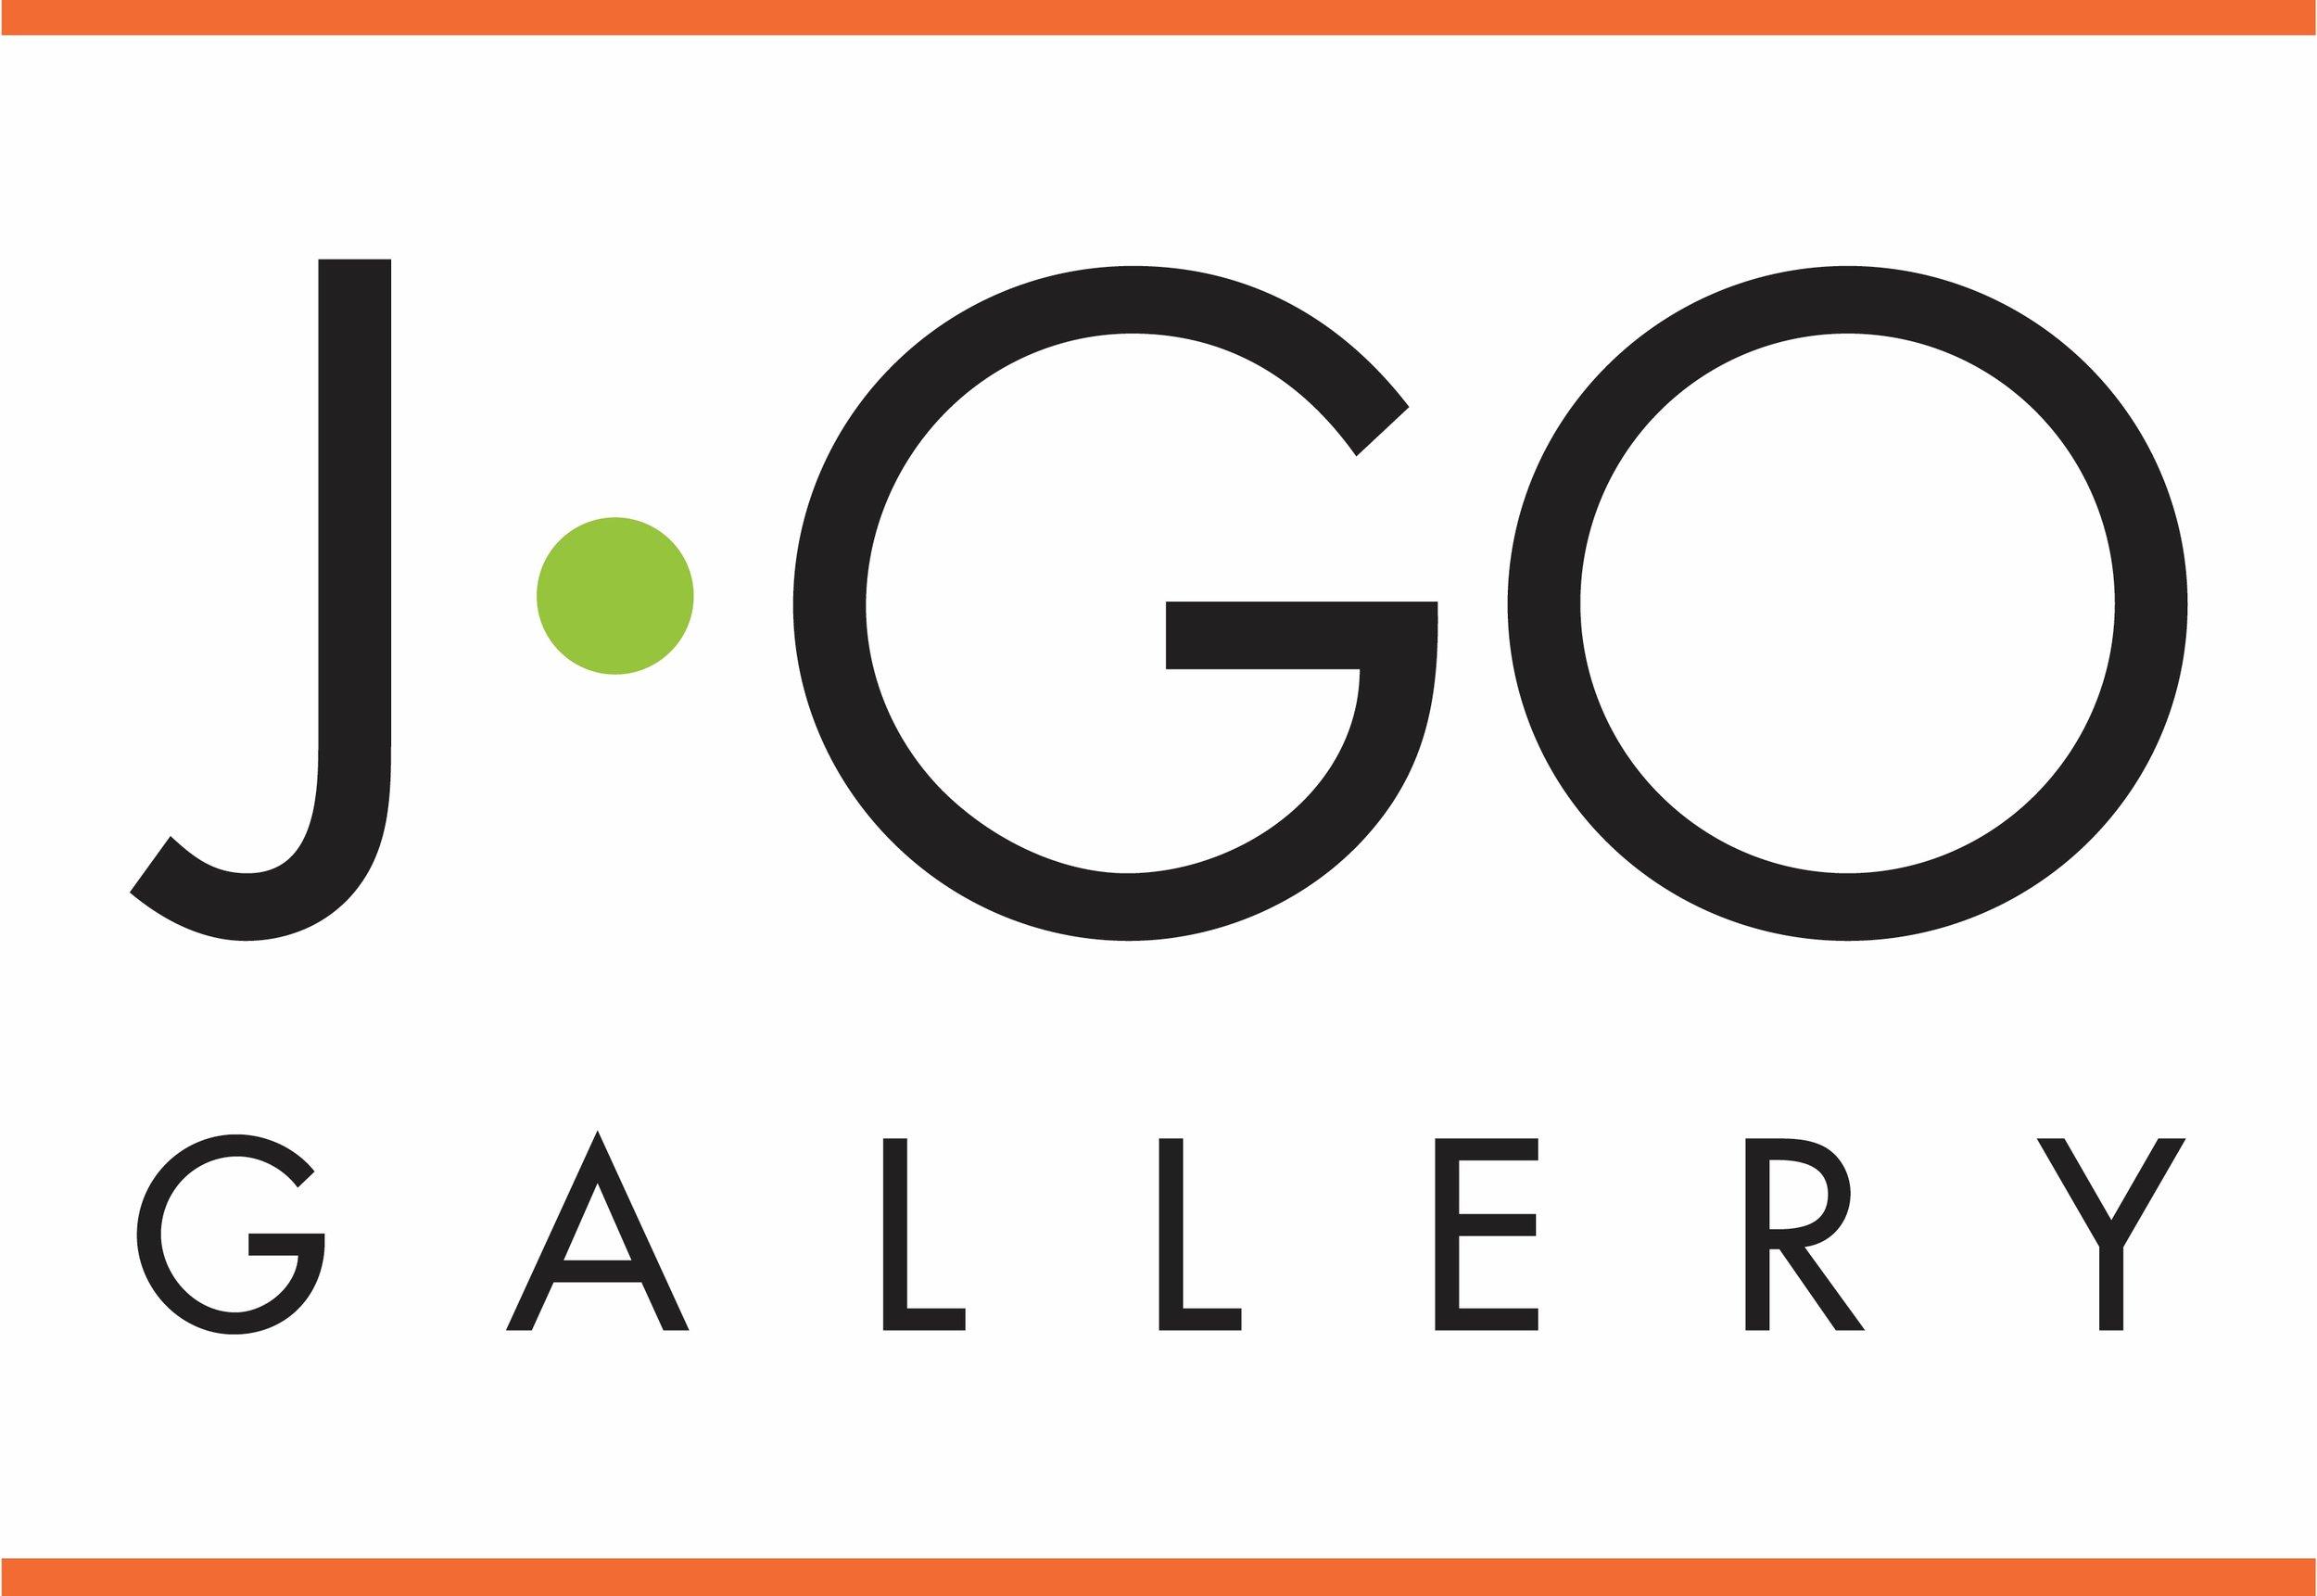 J GO Gallery - PO Box 757, 268 Main Street, Park City, UT 84060435-649-1006jgogallerypc@gmail.comhttps://jgogallery.com/